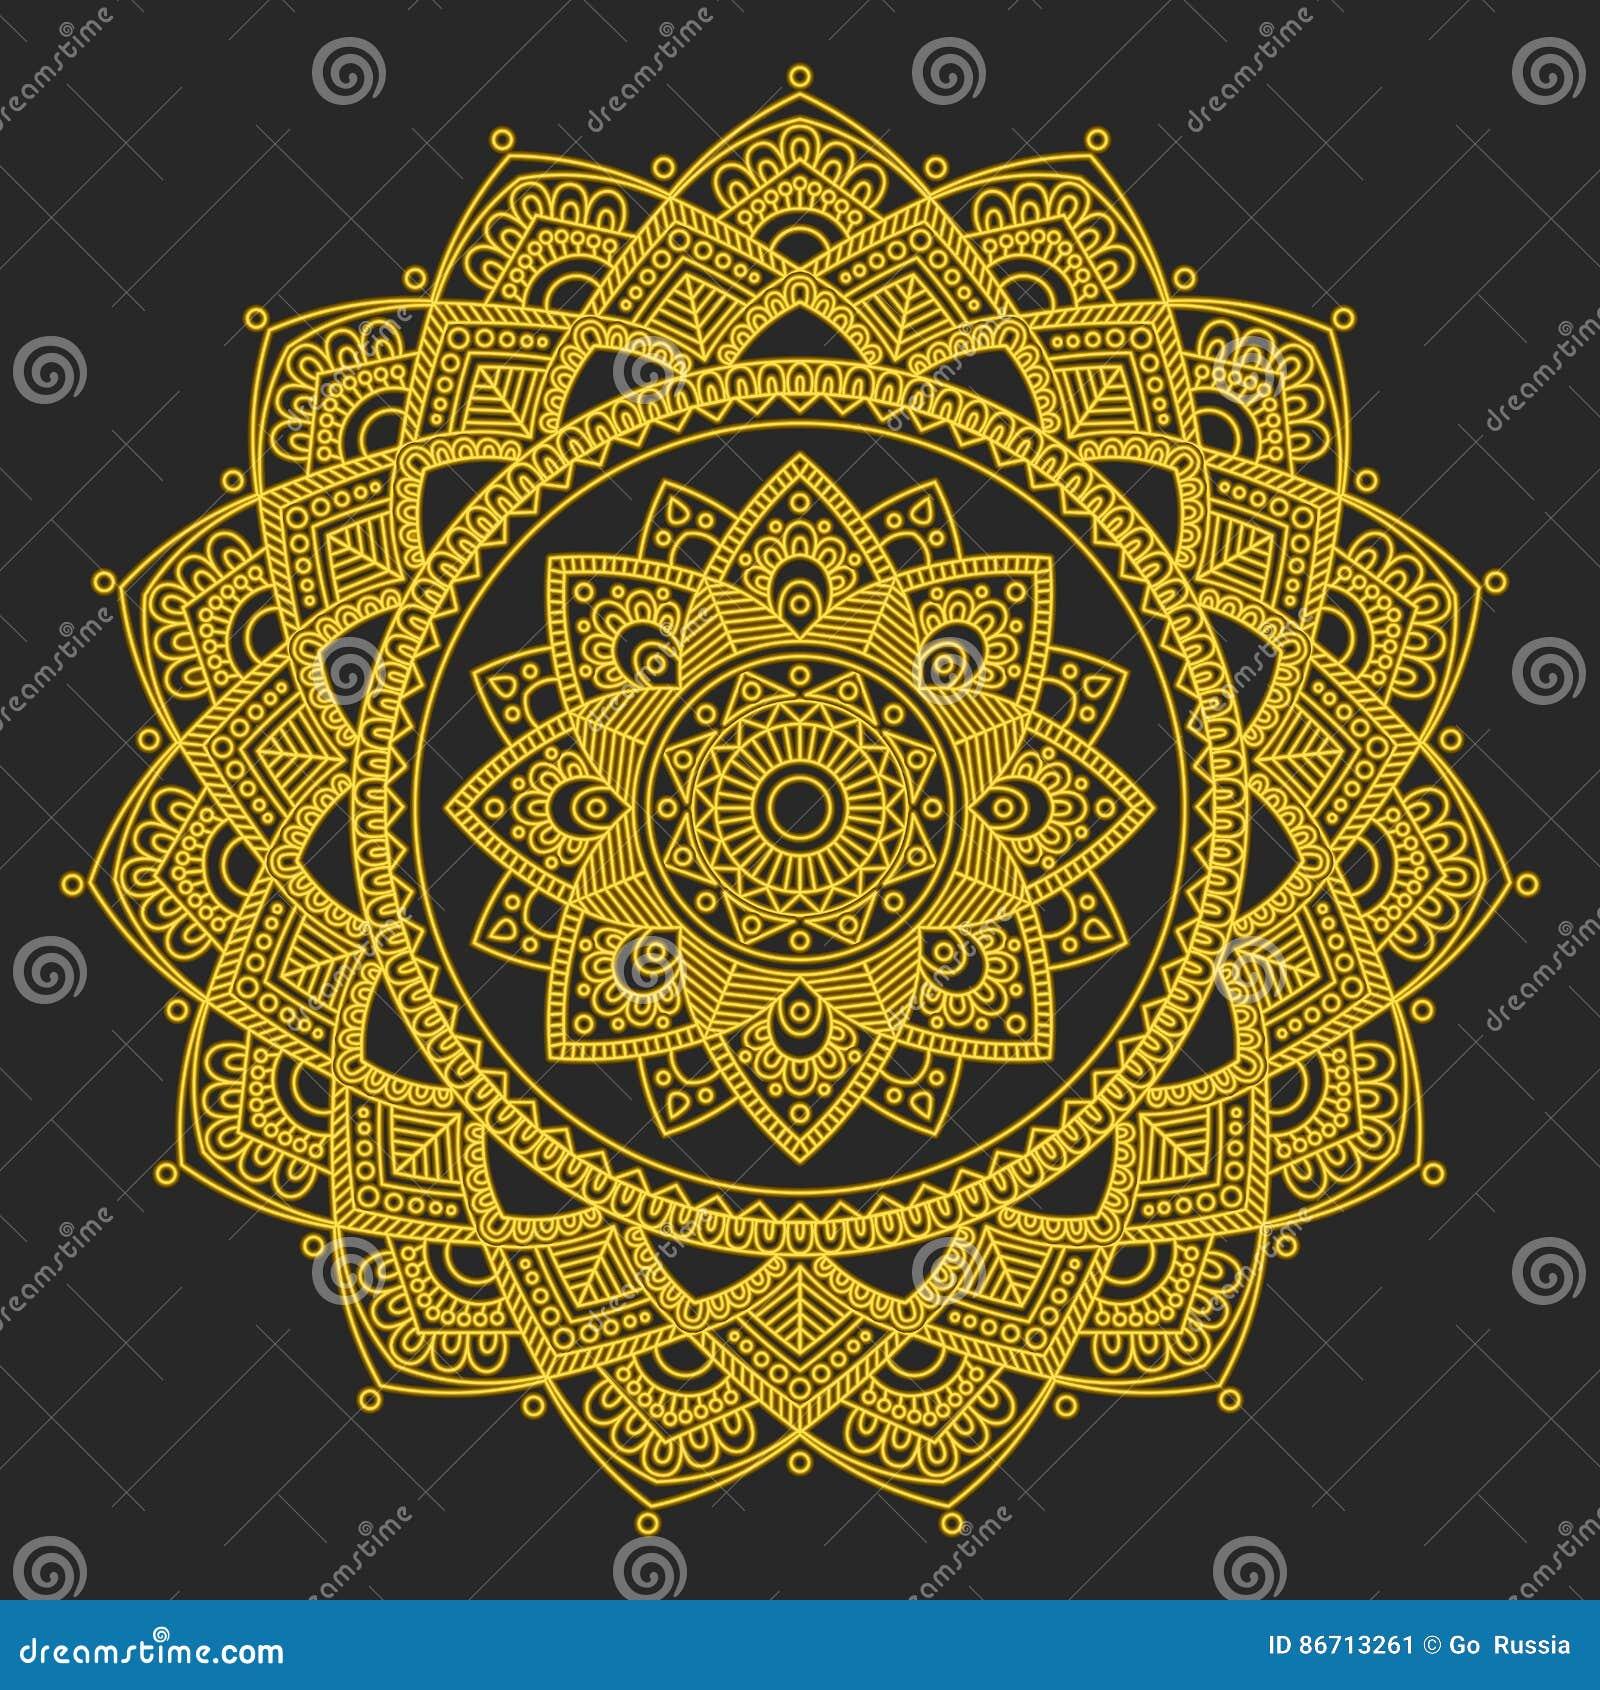 Mandala Indian Antistress Medallion Abstract Islamic